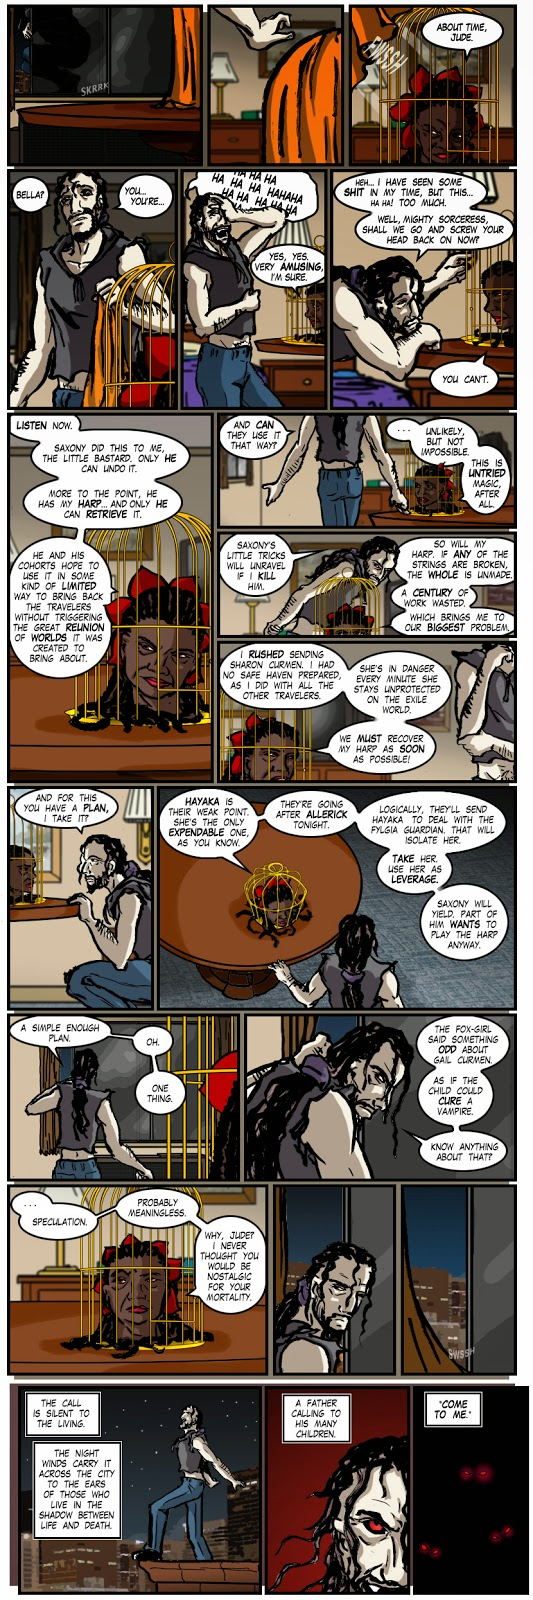 http://talesfromthevault.com/thunderstruck/comic702.html